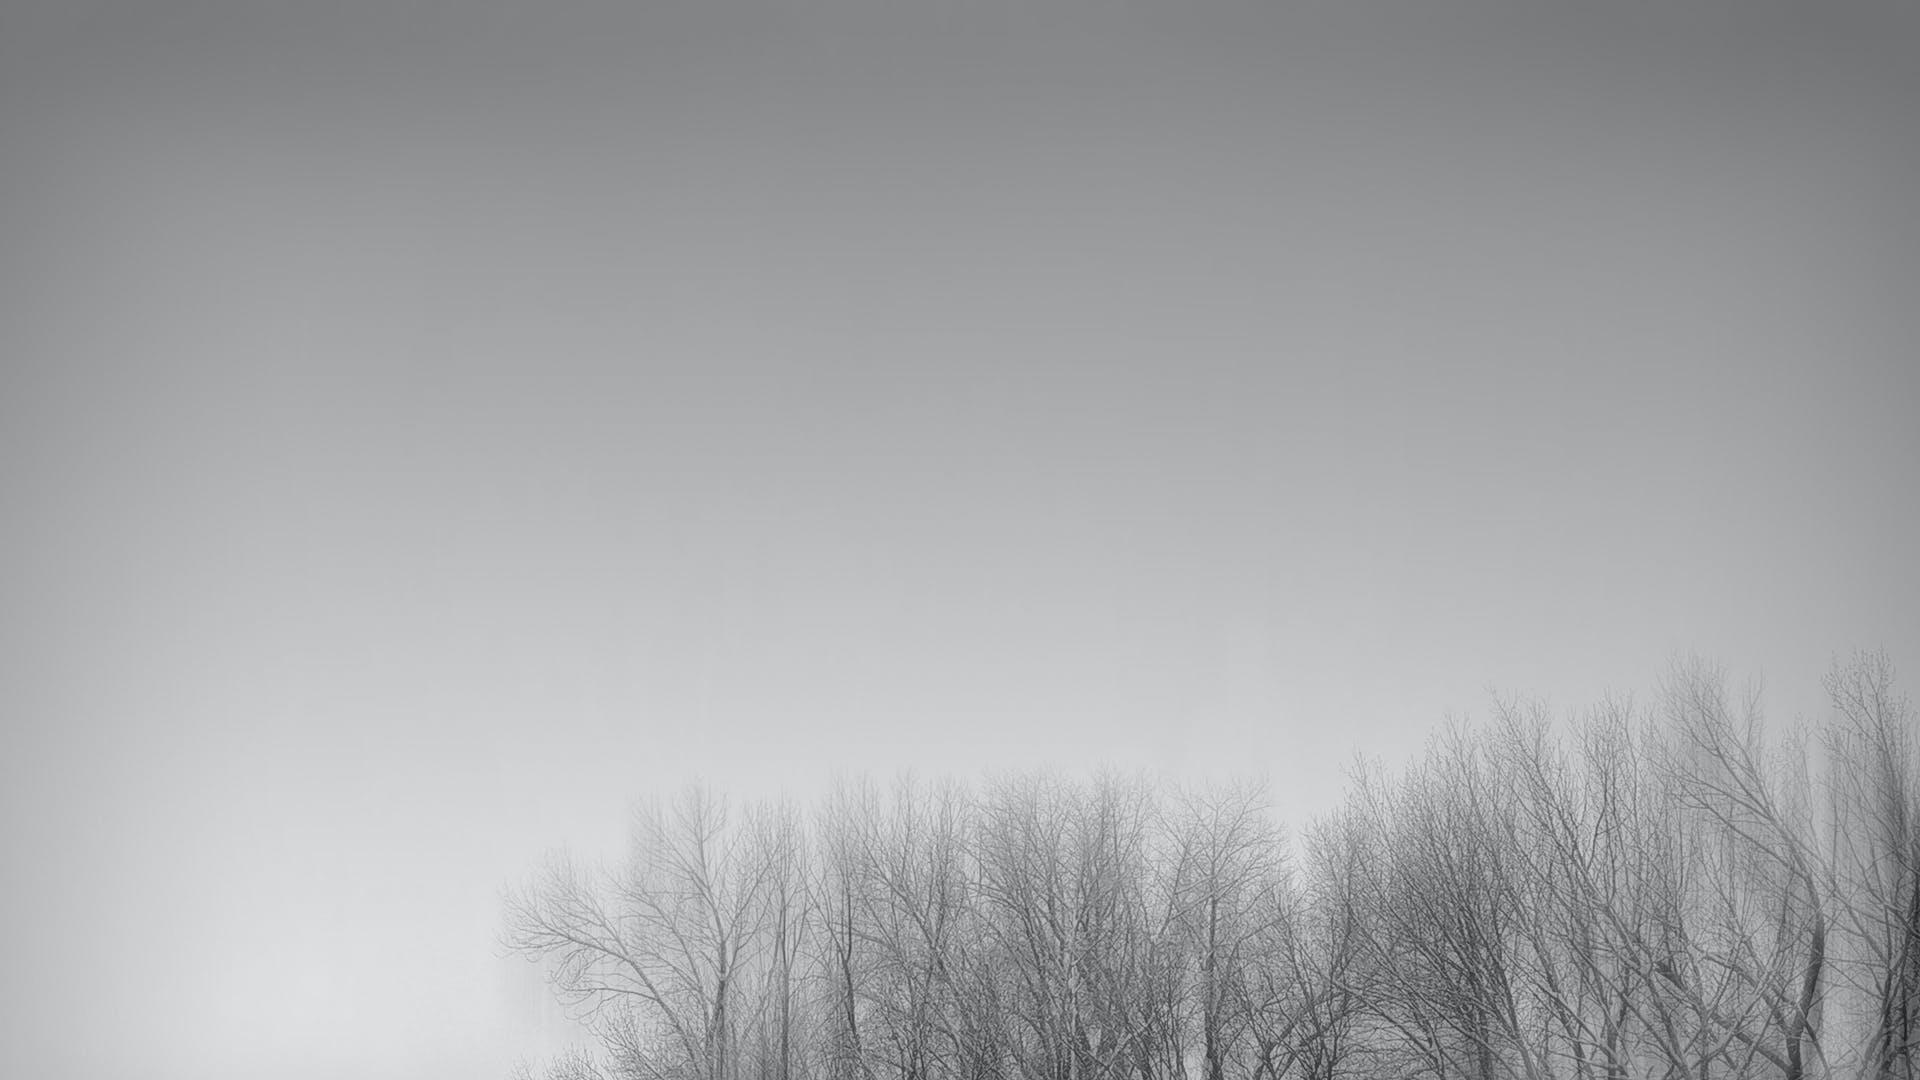 Free stock photo of black and white, minimal, minimalism, trees